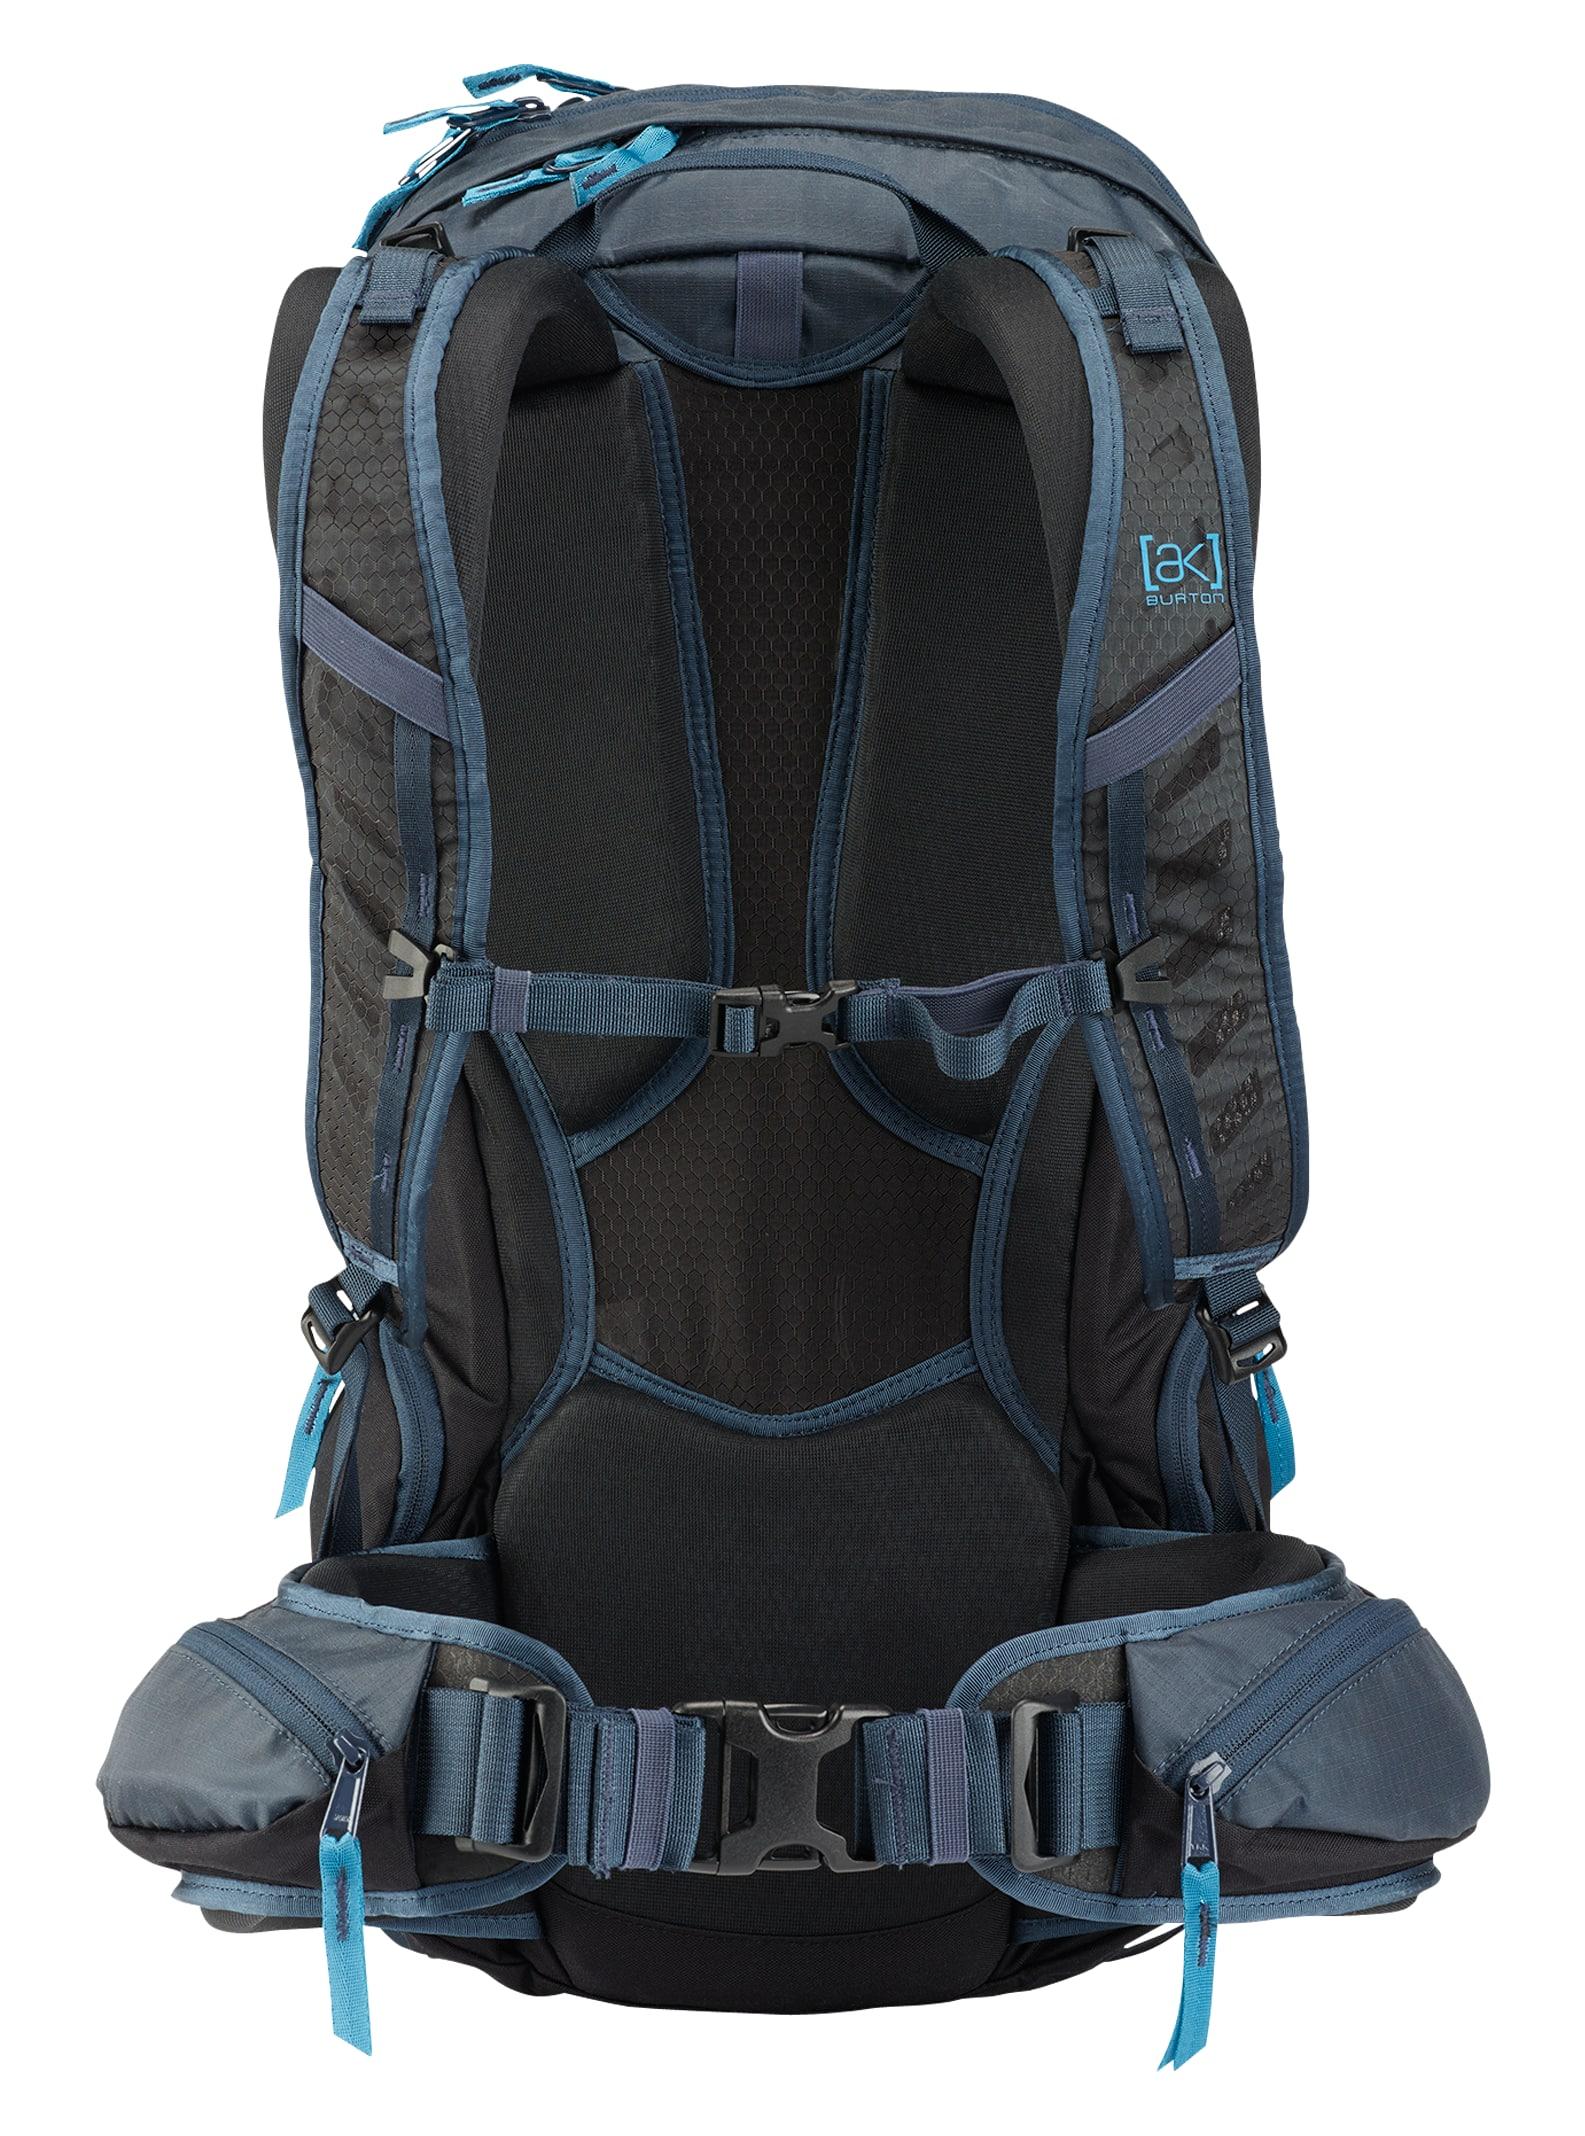 02b9a461308 Burton  ak ® Incline 30L Backpack   Burton.com Spring Summer 2018